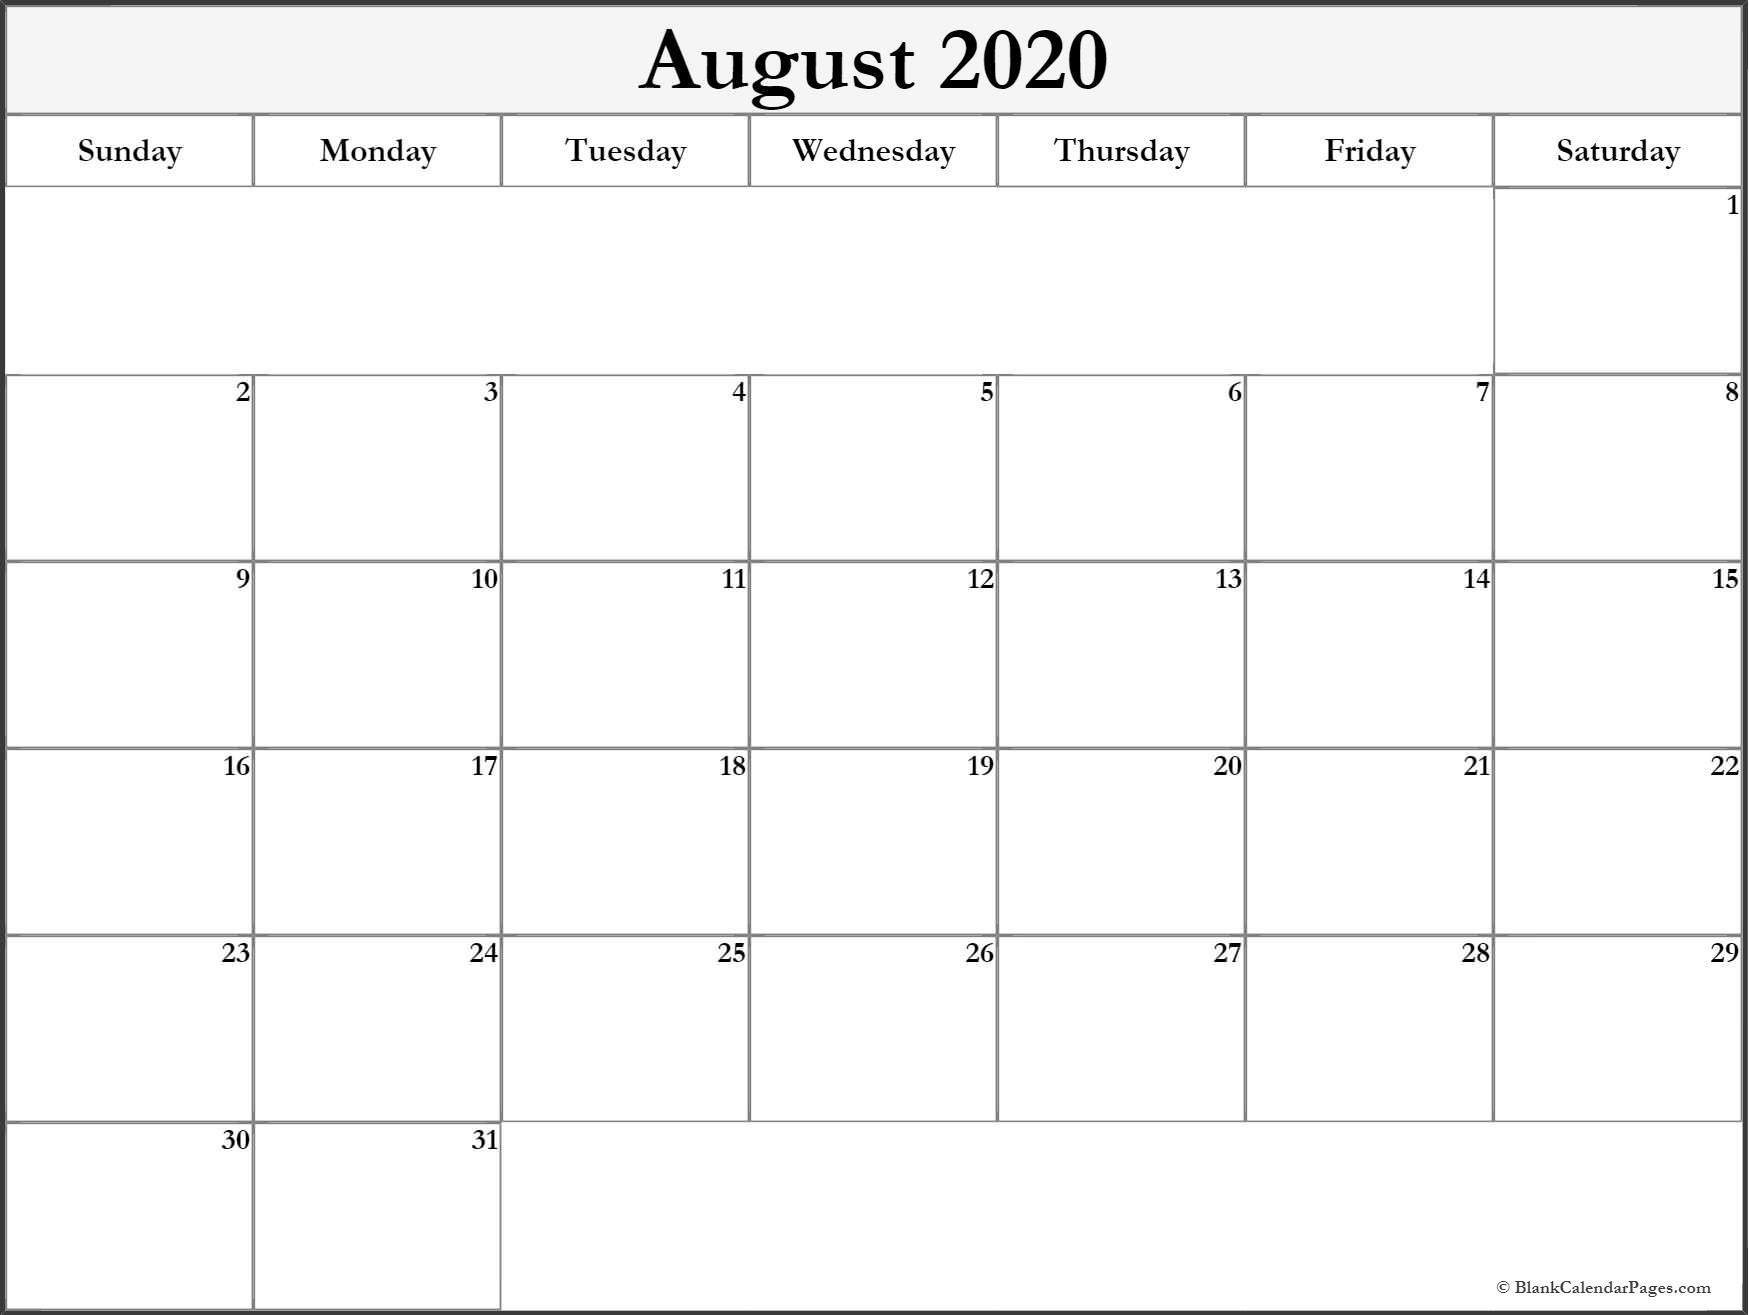 August 2020 Printable Calendar August 2020 Blank Calendar Templates